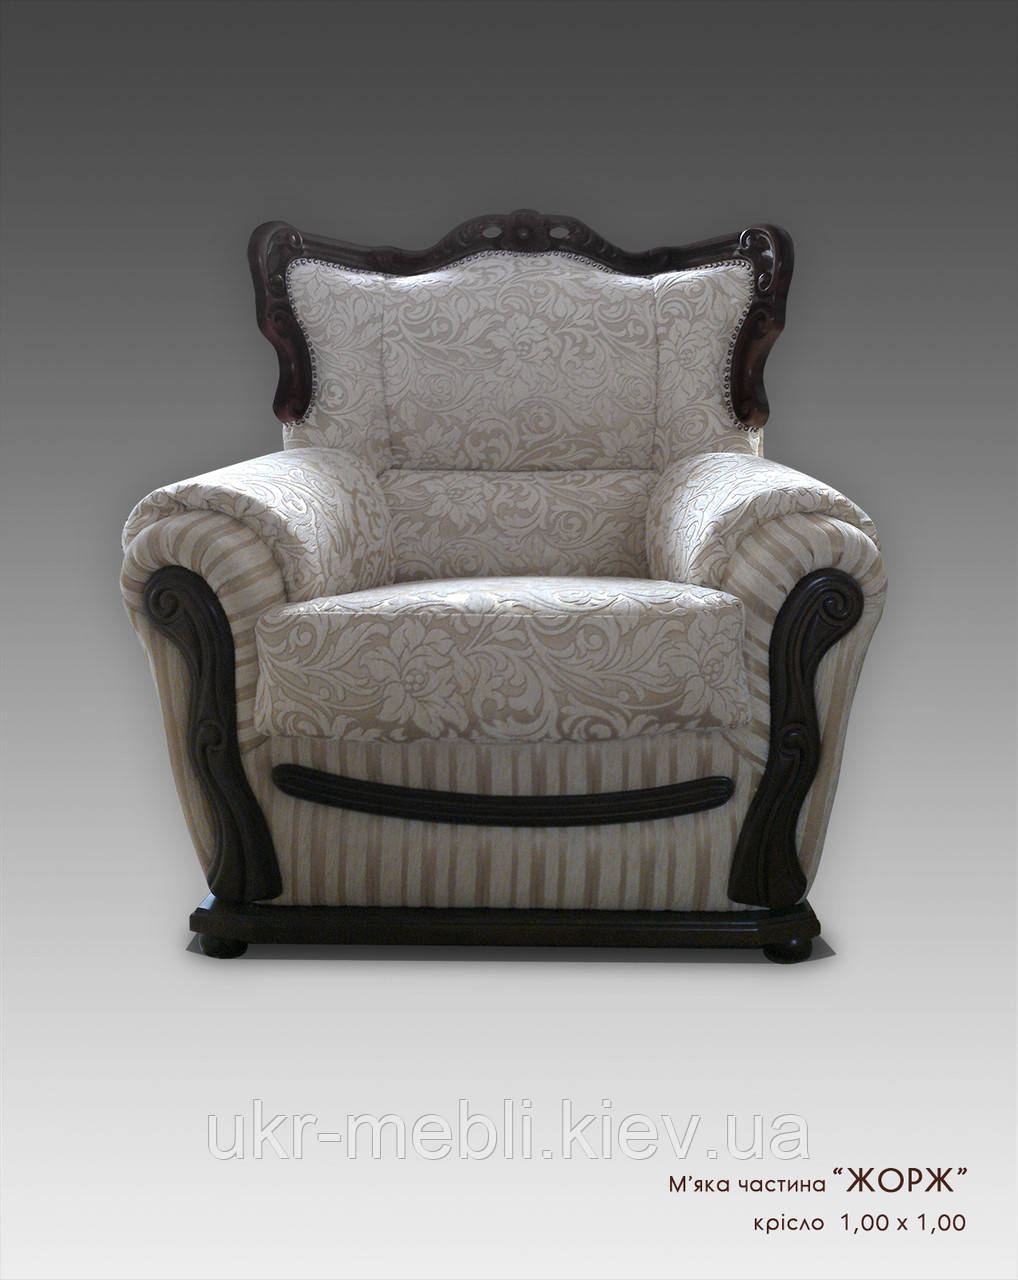 Кресло для отдыха Жорж, Аланда